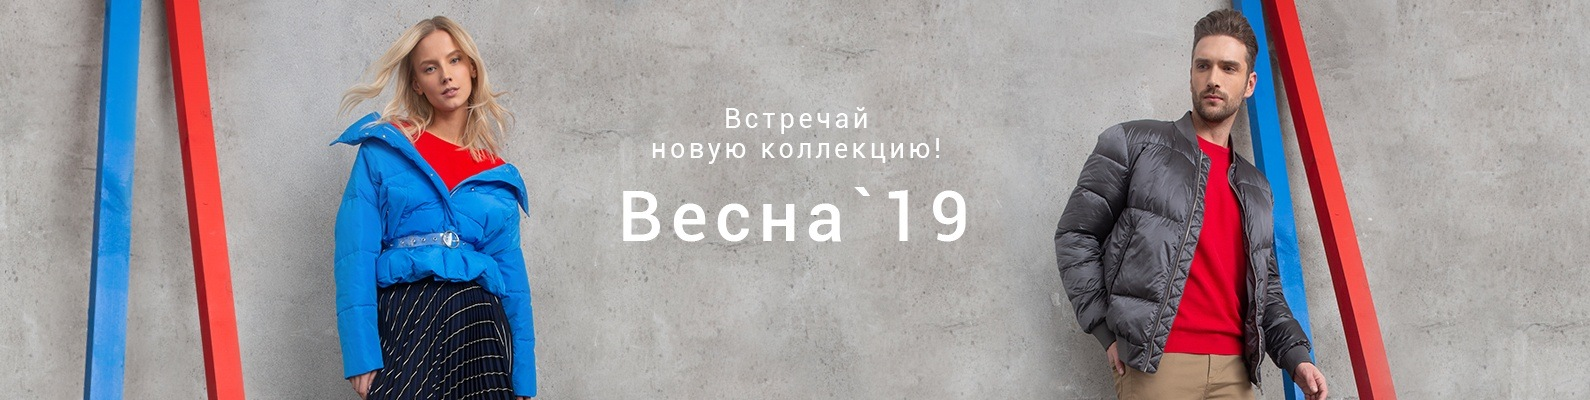 O STIN   ОСТИН   ВКонтакте 7f66598baad